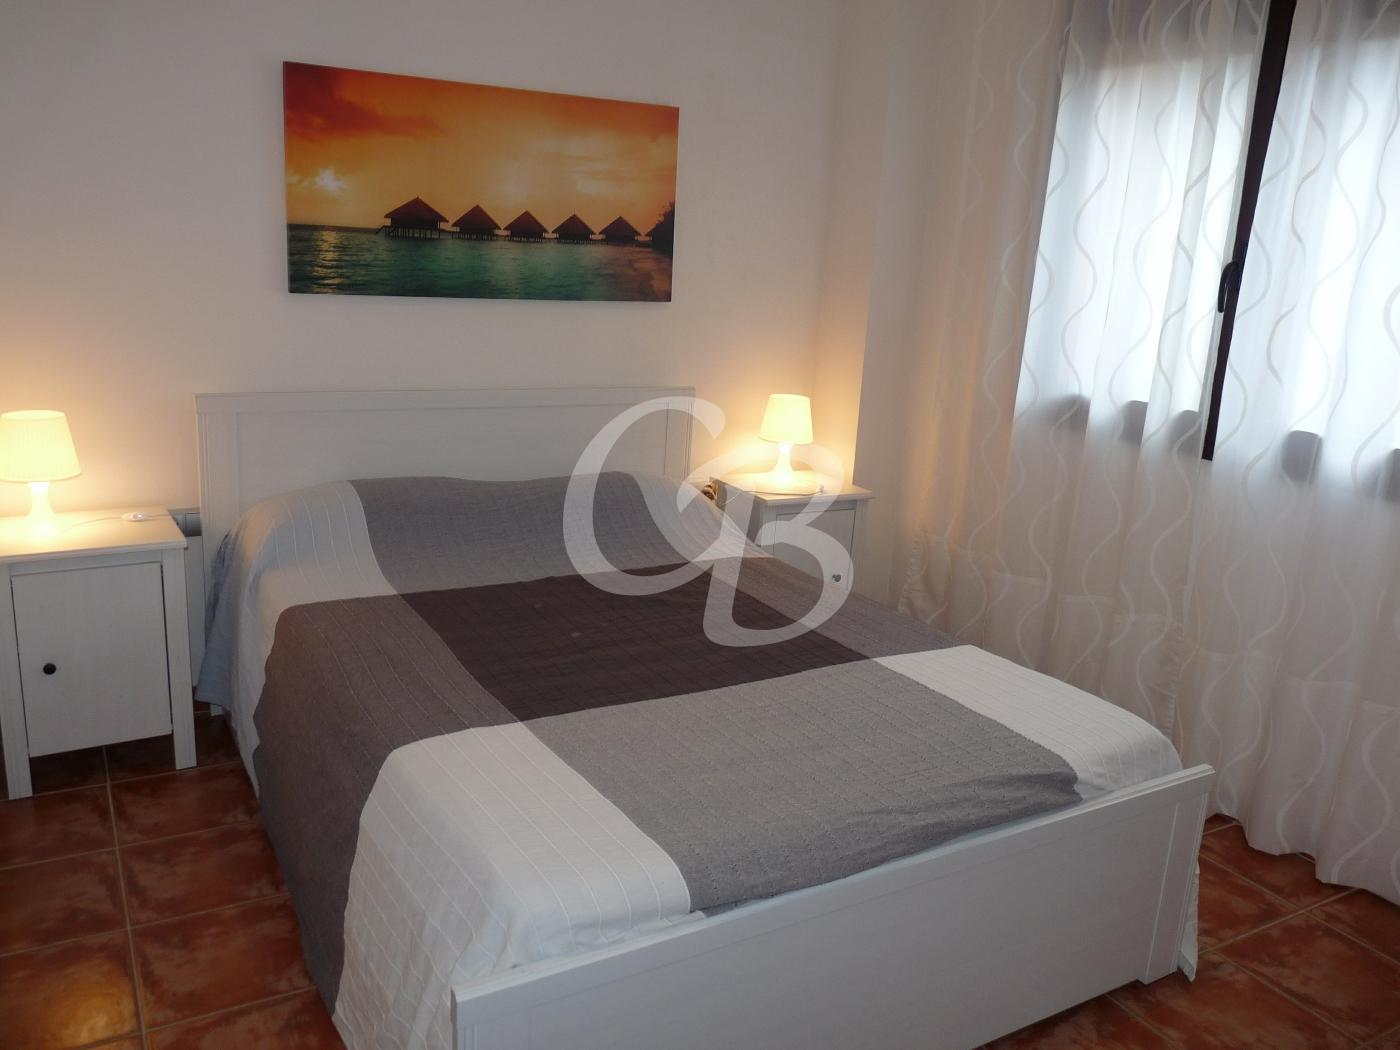 1061 APARTAMENTO DÚPLEX EN EL CENTRO DE BEGUR Apartment  Begur